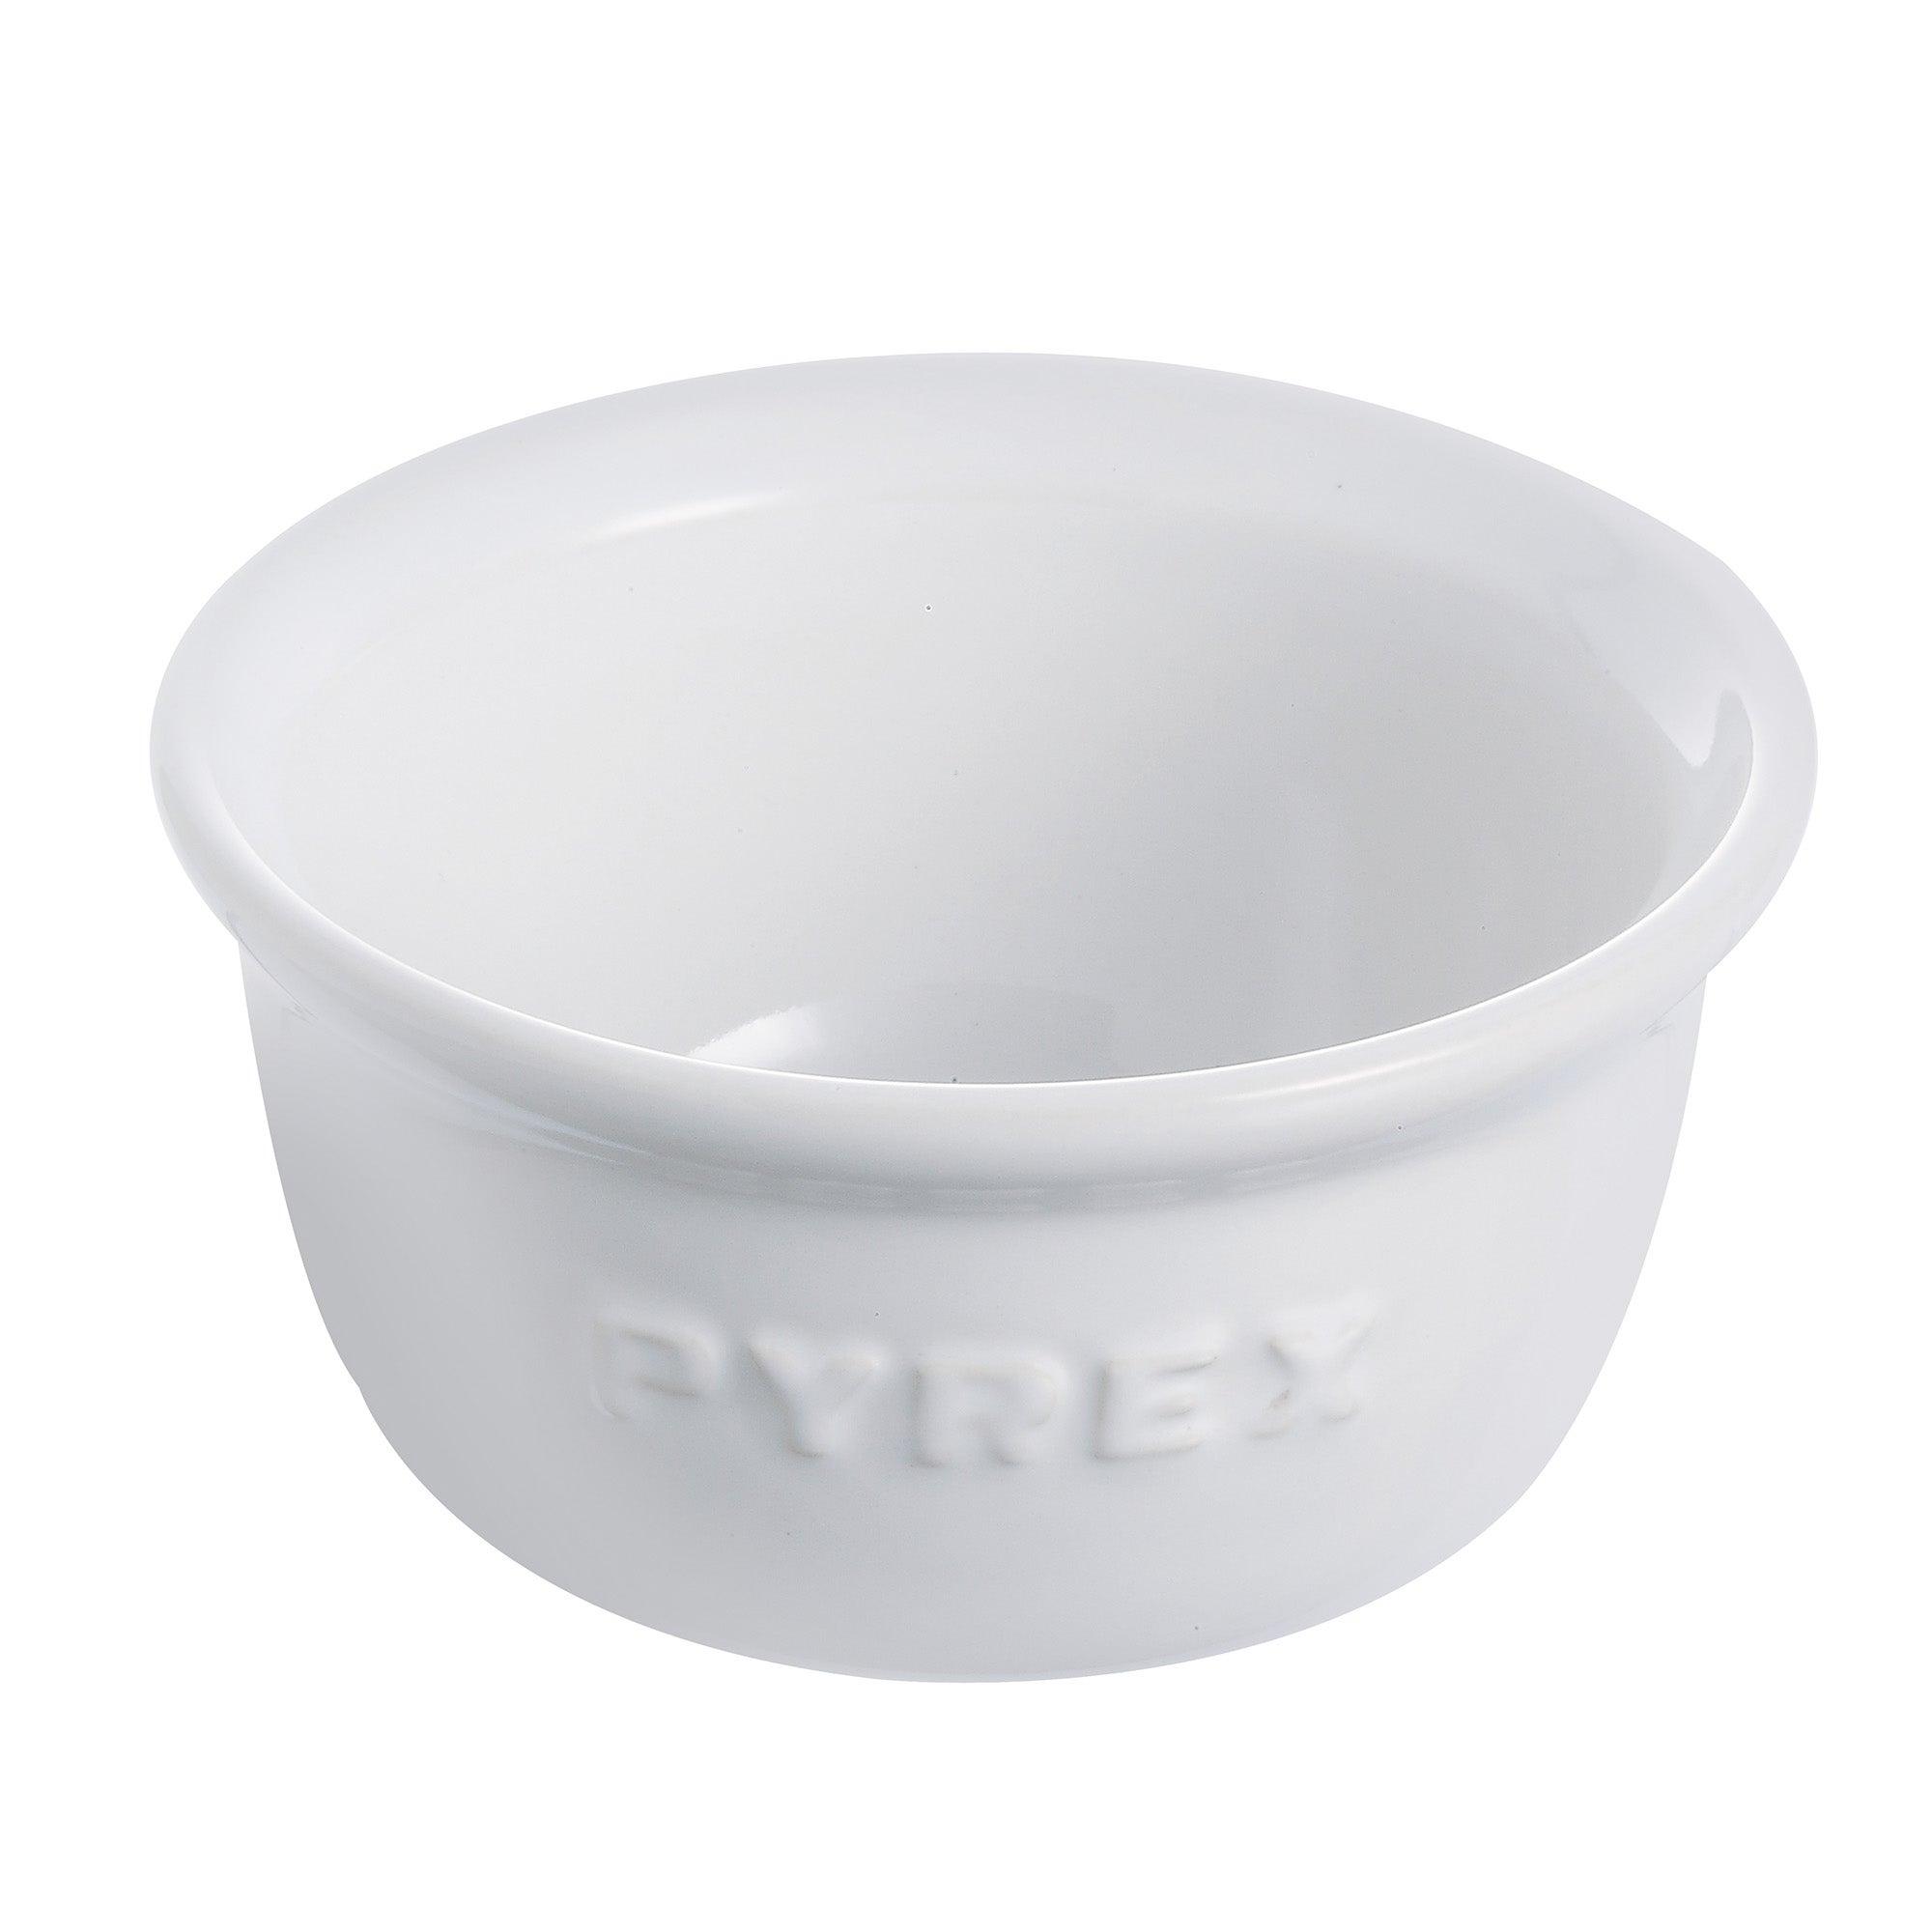 Pyrex Set of 2 White Ramekins